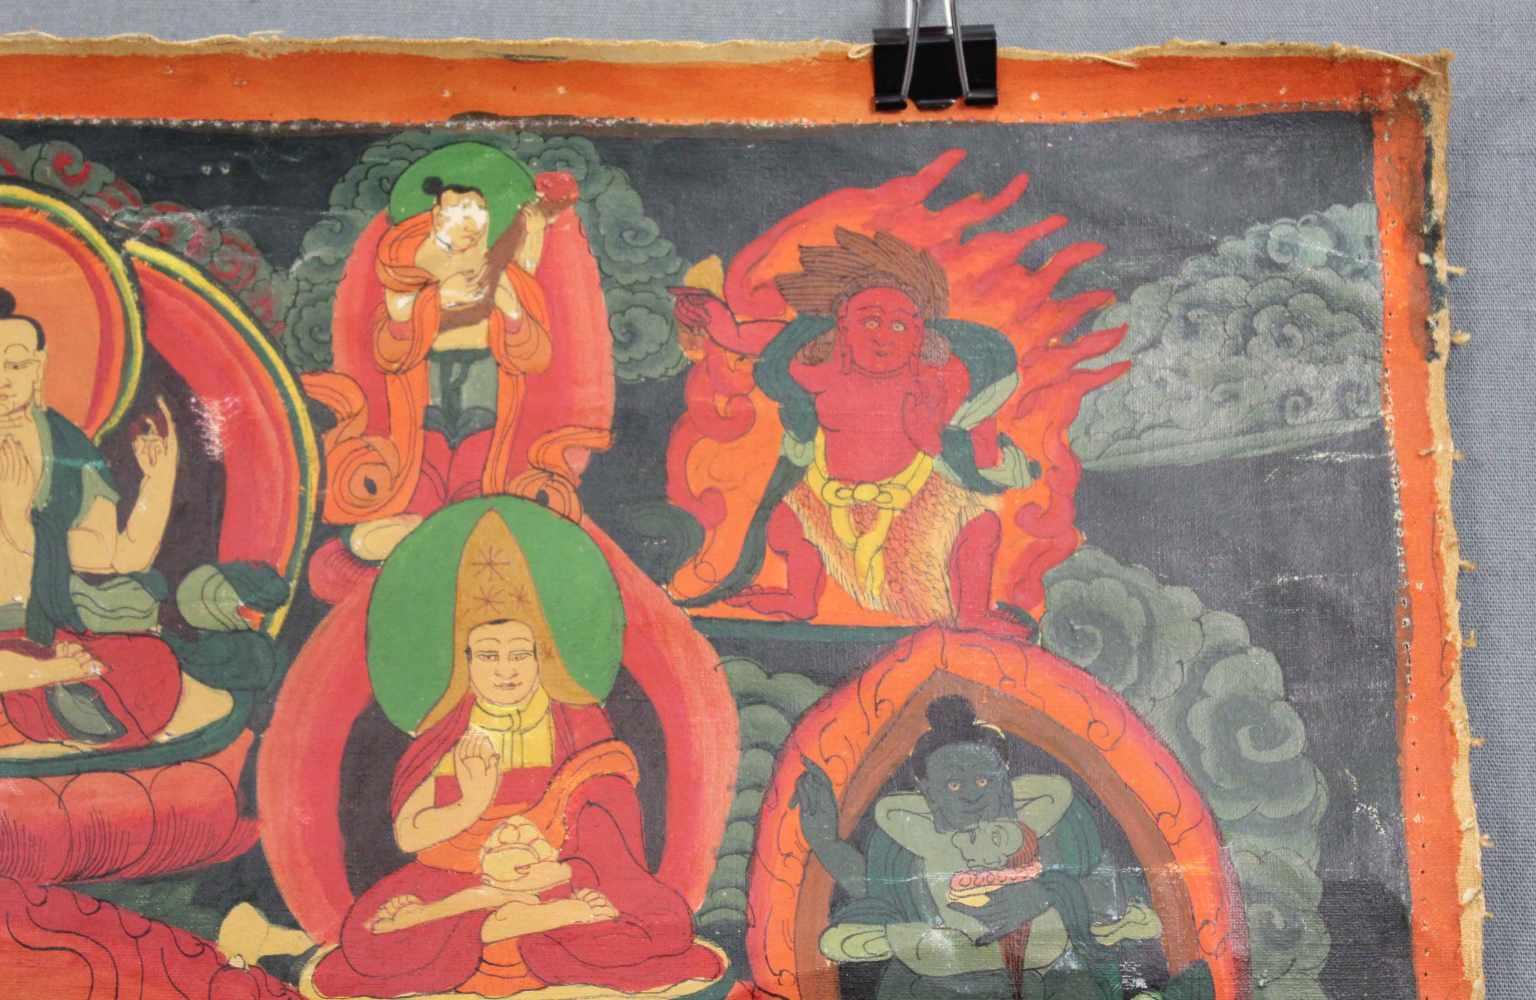 Lot 59 - Thangka, China / Tibet alt. Wohl Vajrakila mit Dakini ?59,5 cm x 44,5 cm. Gemälde. Stehend auf